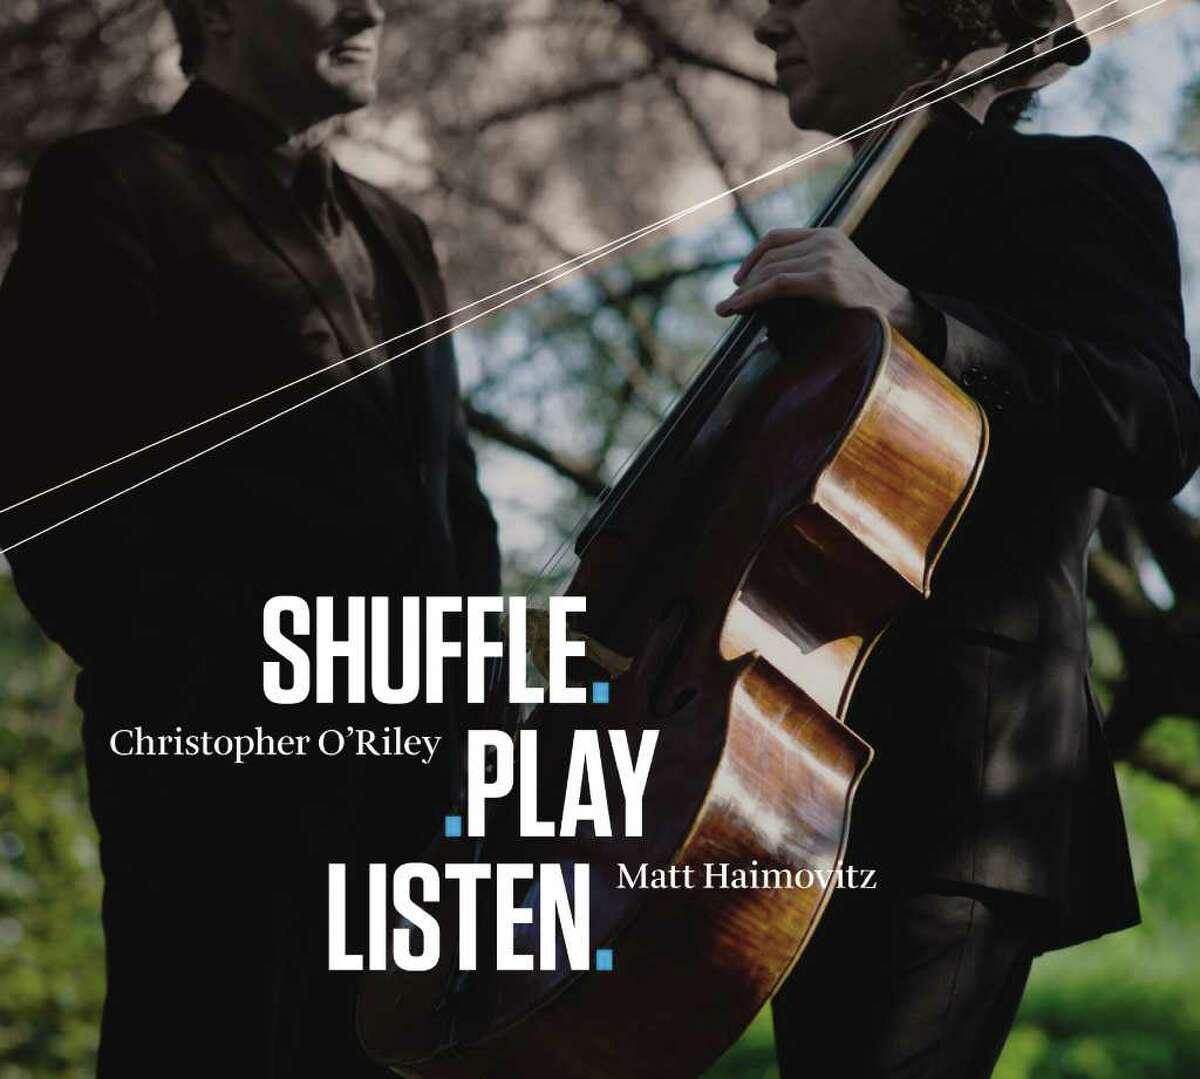 Shuffle Play Listen by Matt Haimovitz and Christopher O'Riley